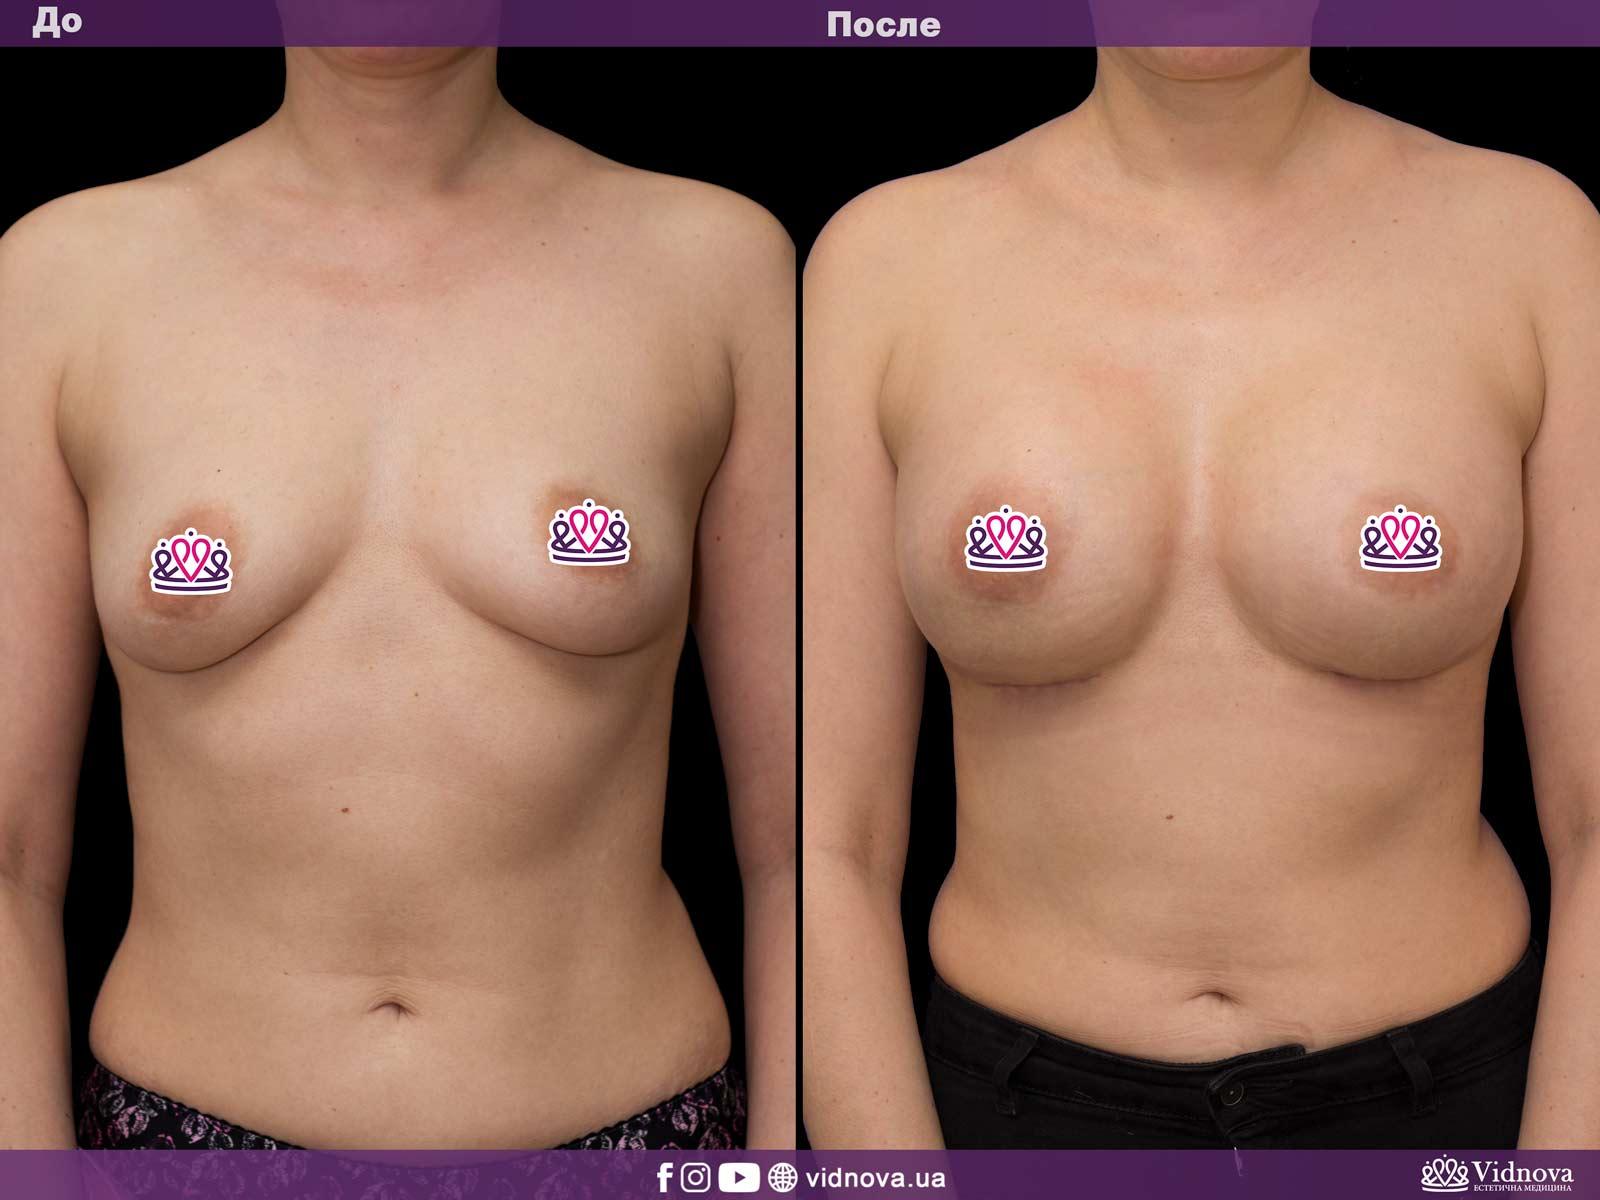 Увеличение груди: Фото ДО и ПОСЛЕ - Пример №30-1 - Клиника Vidnova